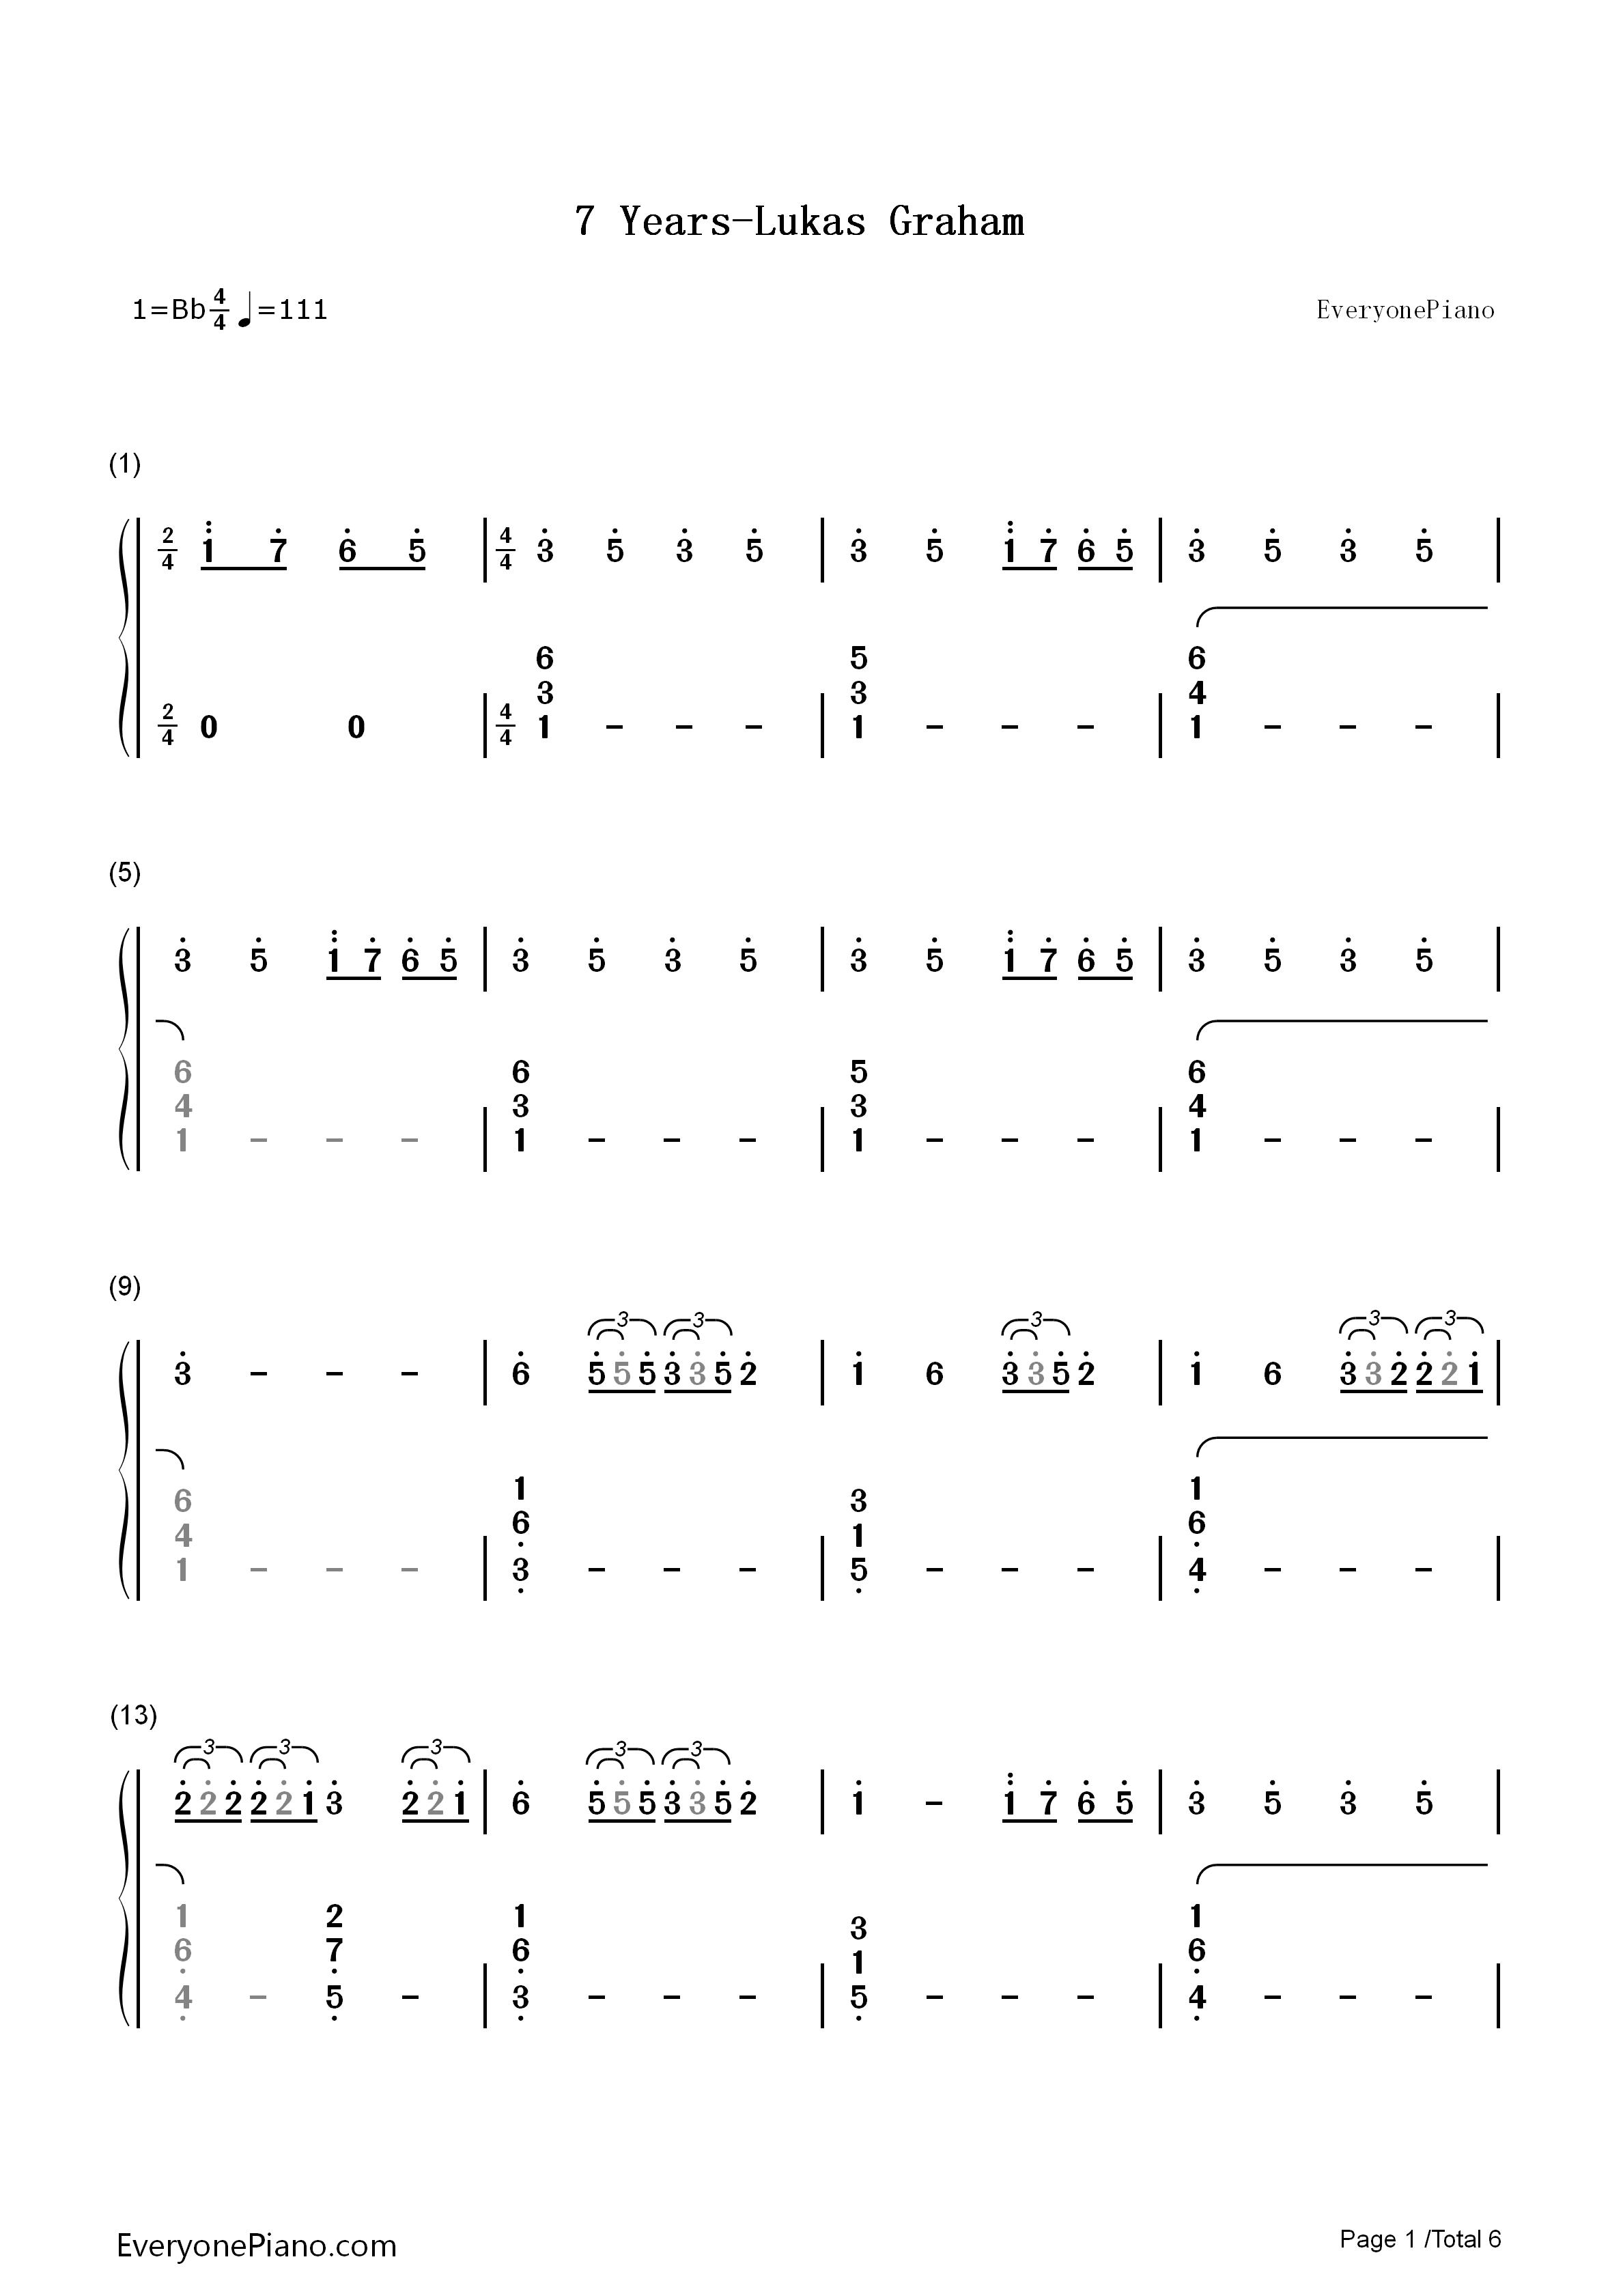 7 years-lukas graham双手简谱预览1-钢琴谱(五线谱,)